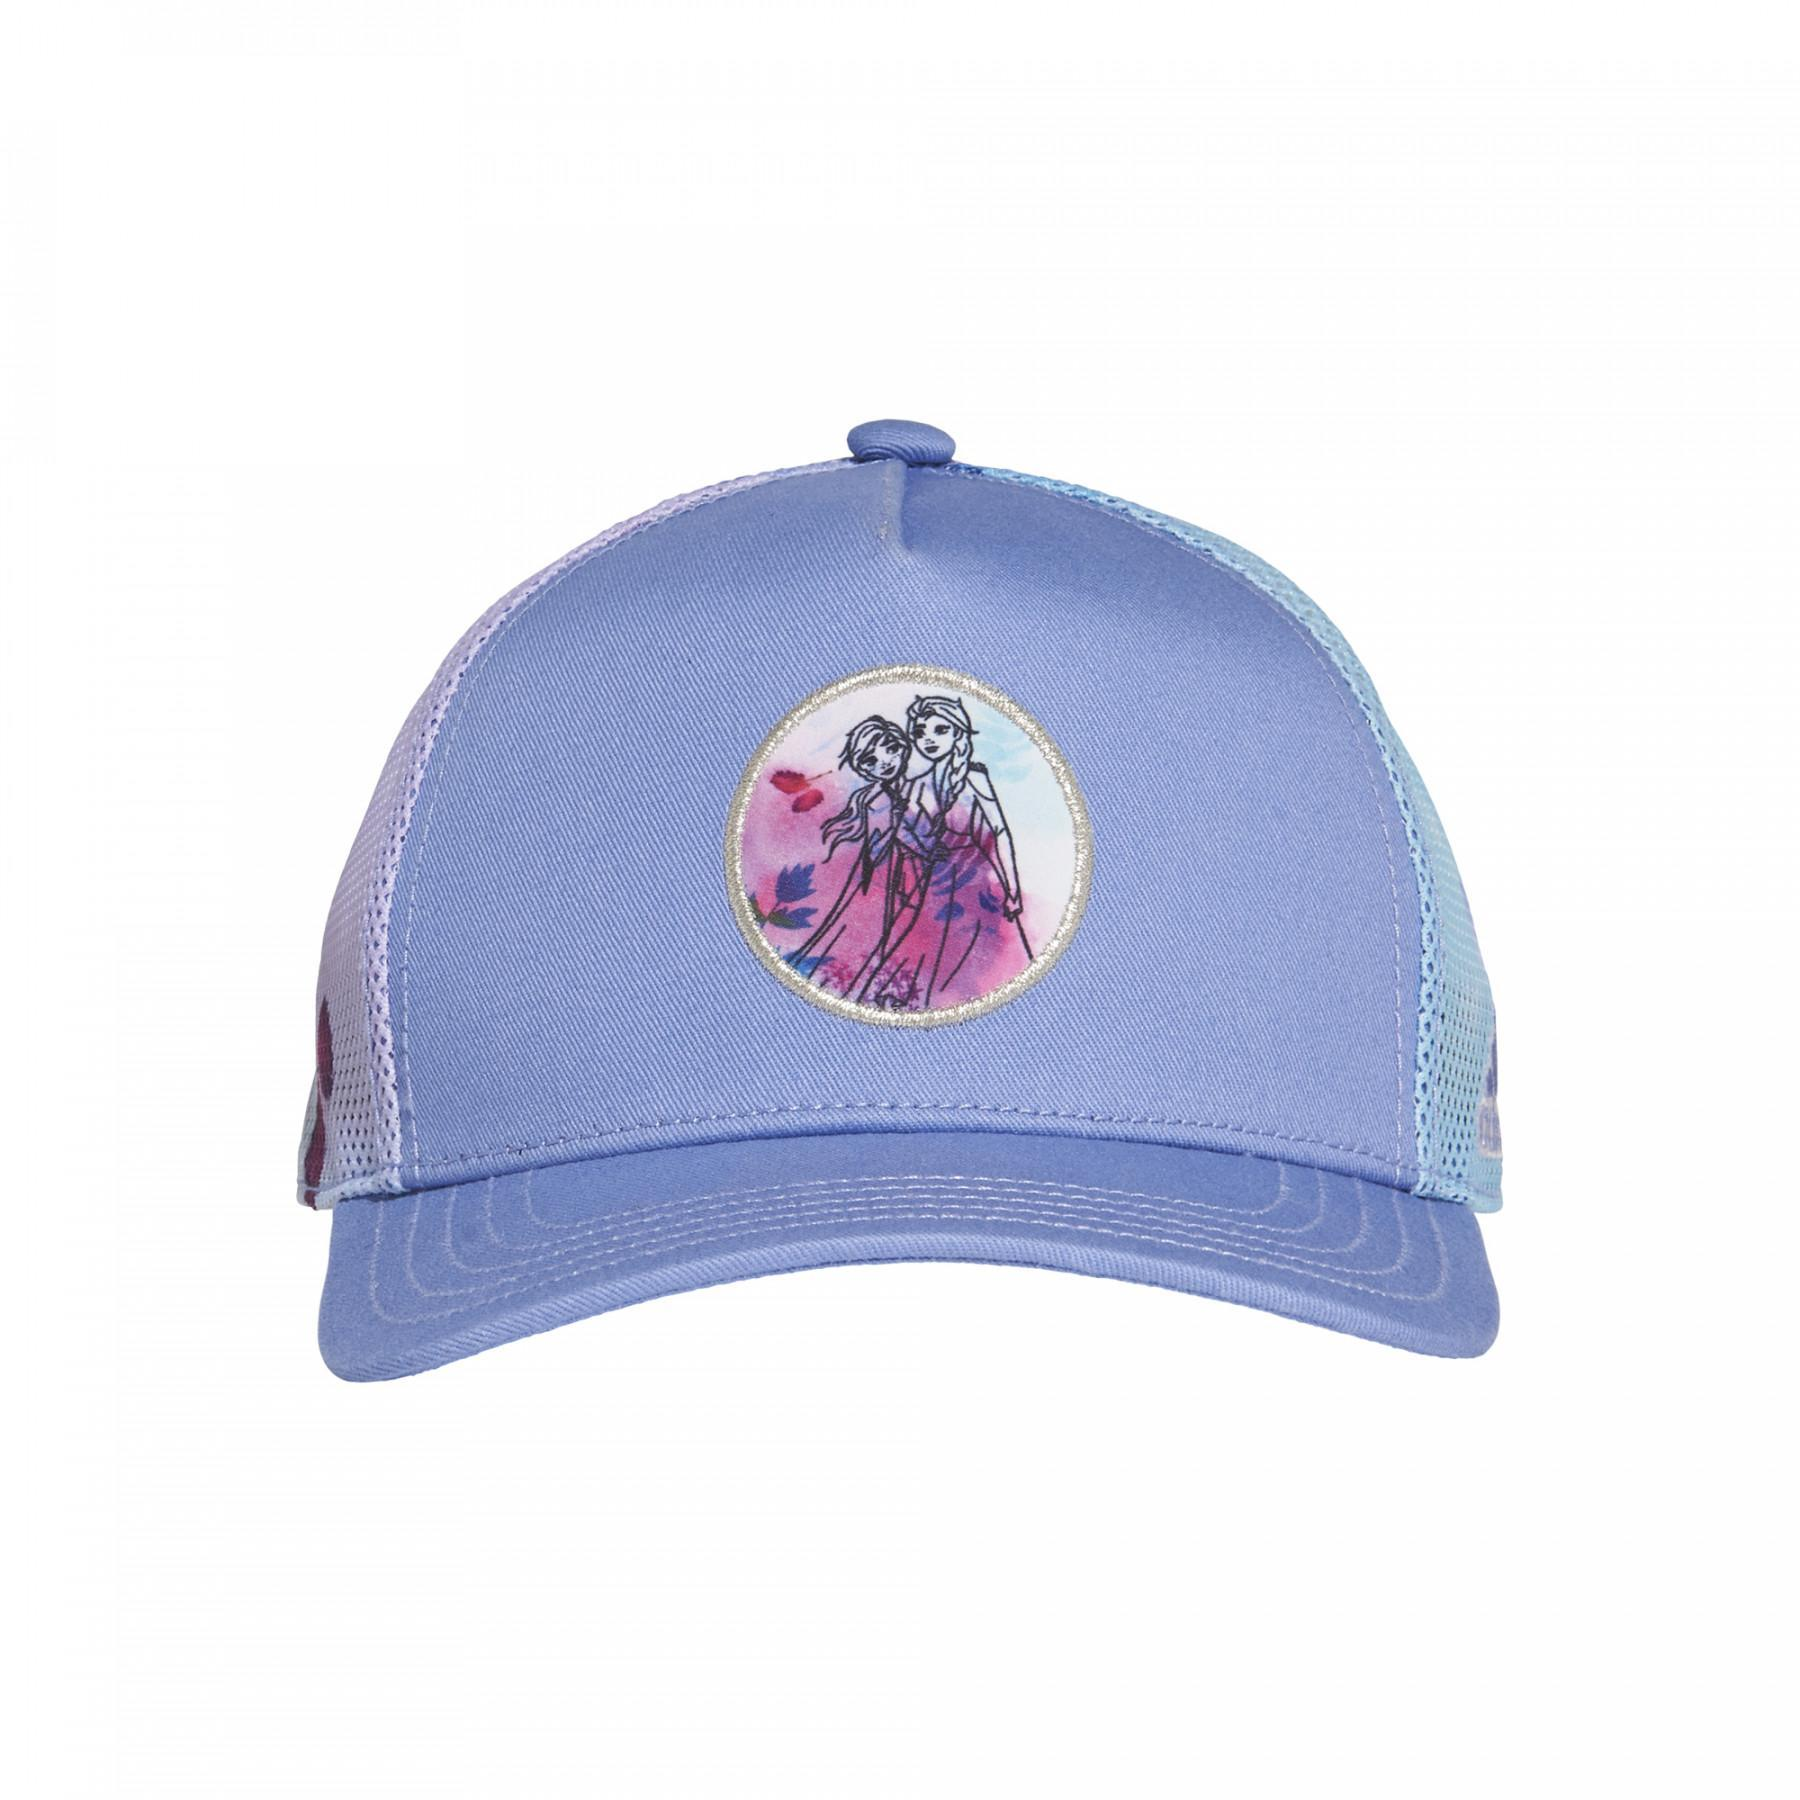 adidas La Reine des Neiges Graphic Children's Cap